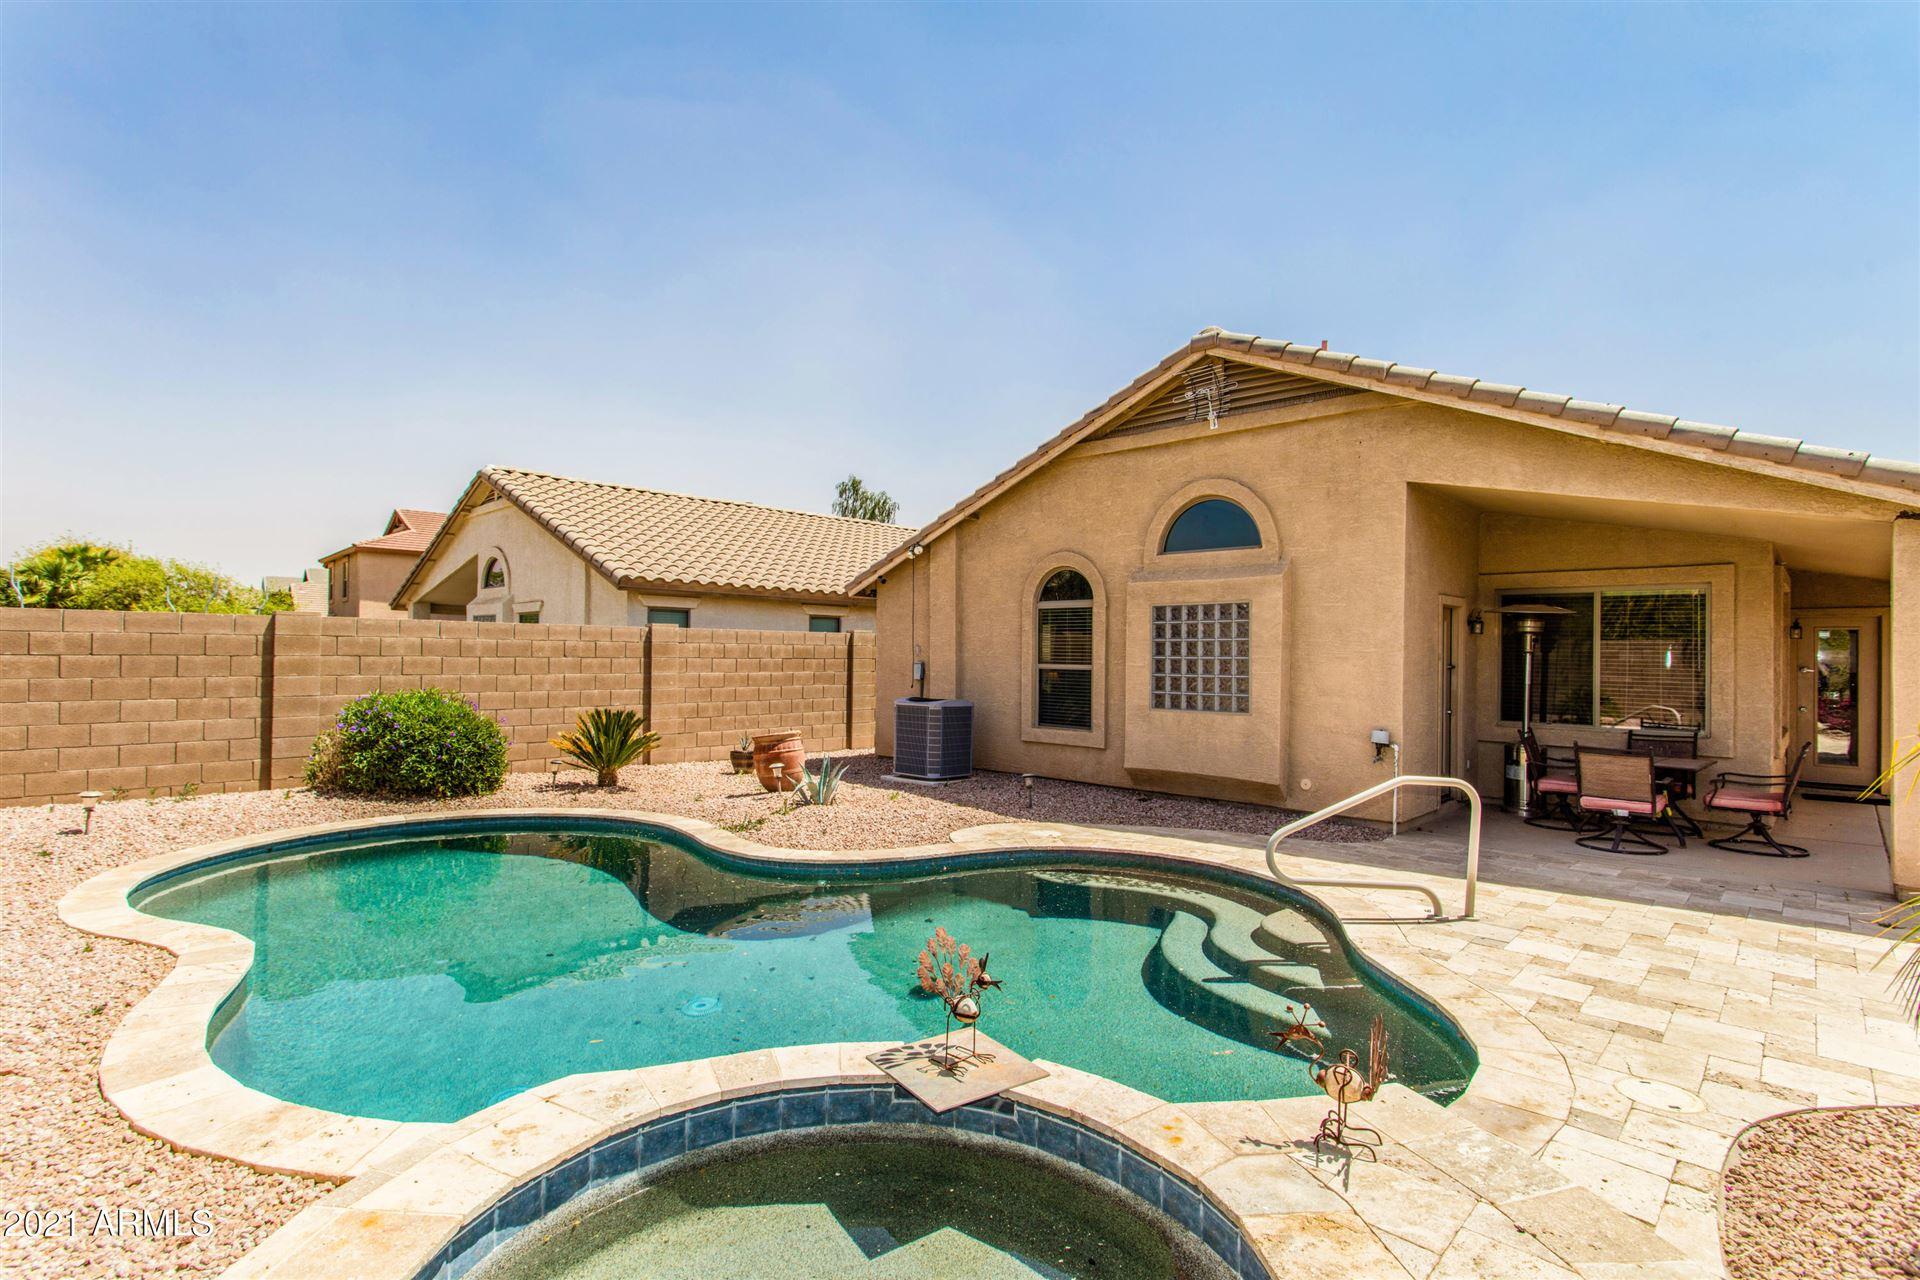 Photo of 514 W DANA Drive, San Tan Valley, AZ 85143 (MLS # 6227368)